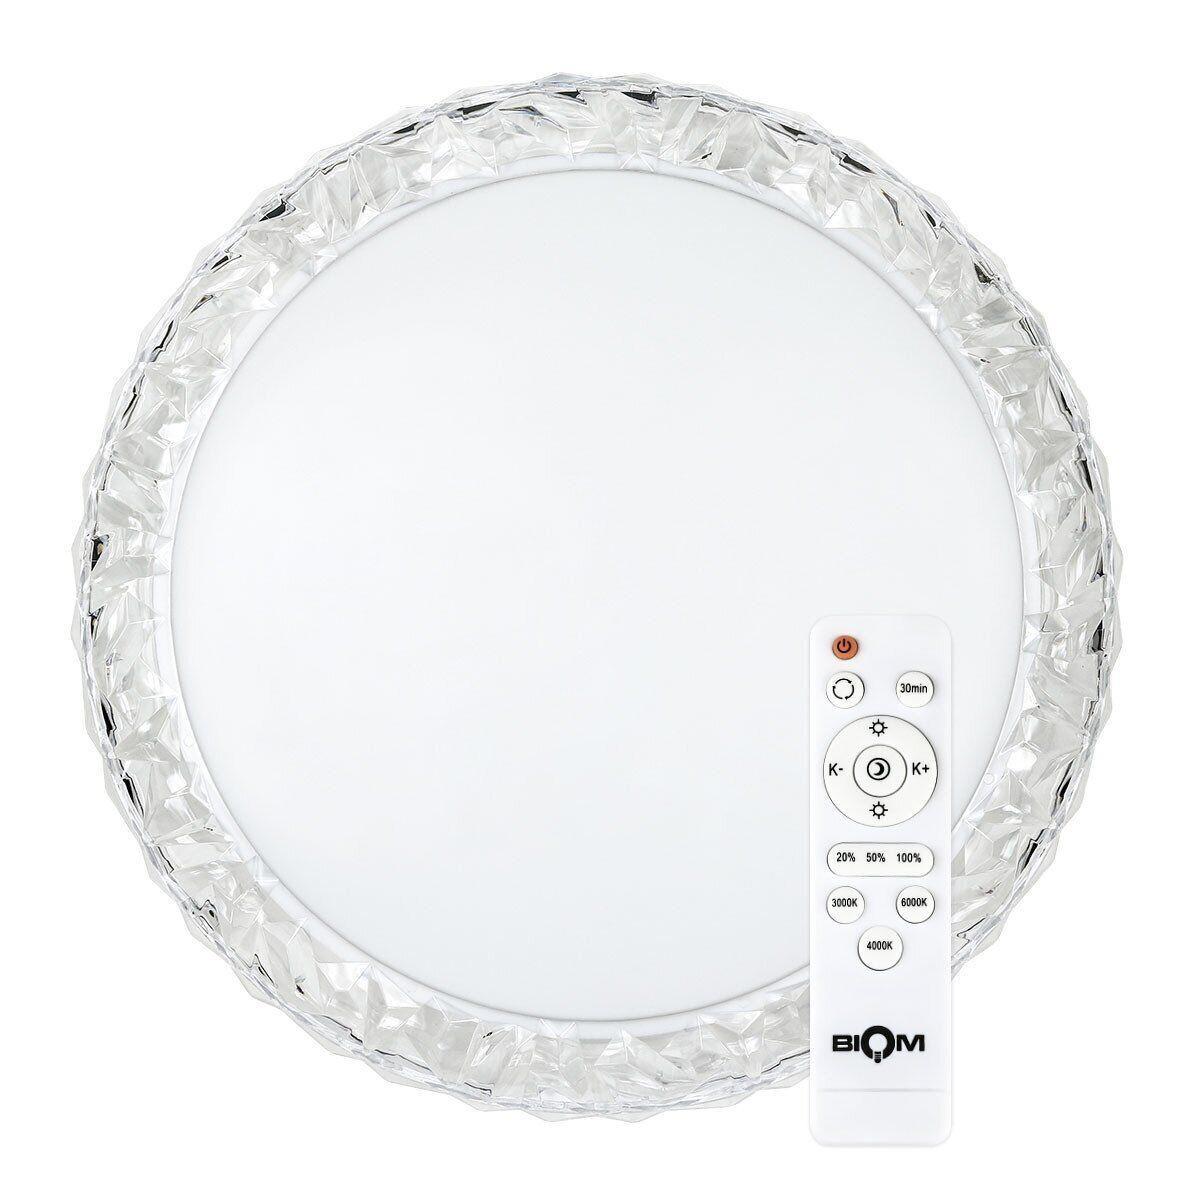 LED Светильник Biom Smart 80W 6400Lm SML-R09-80